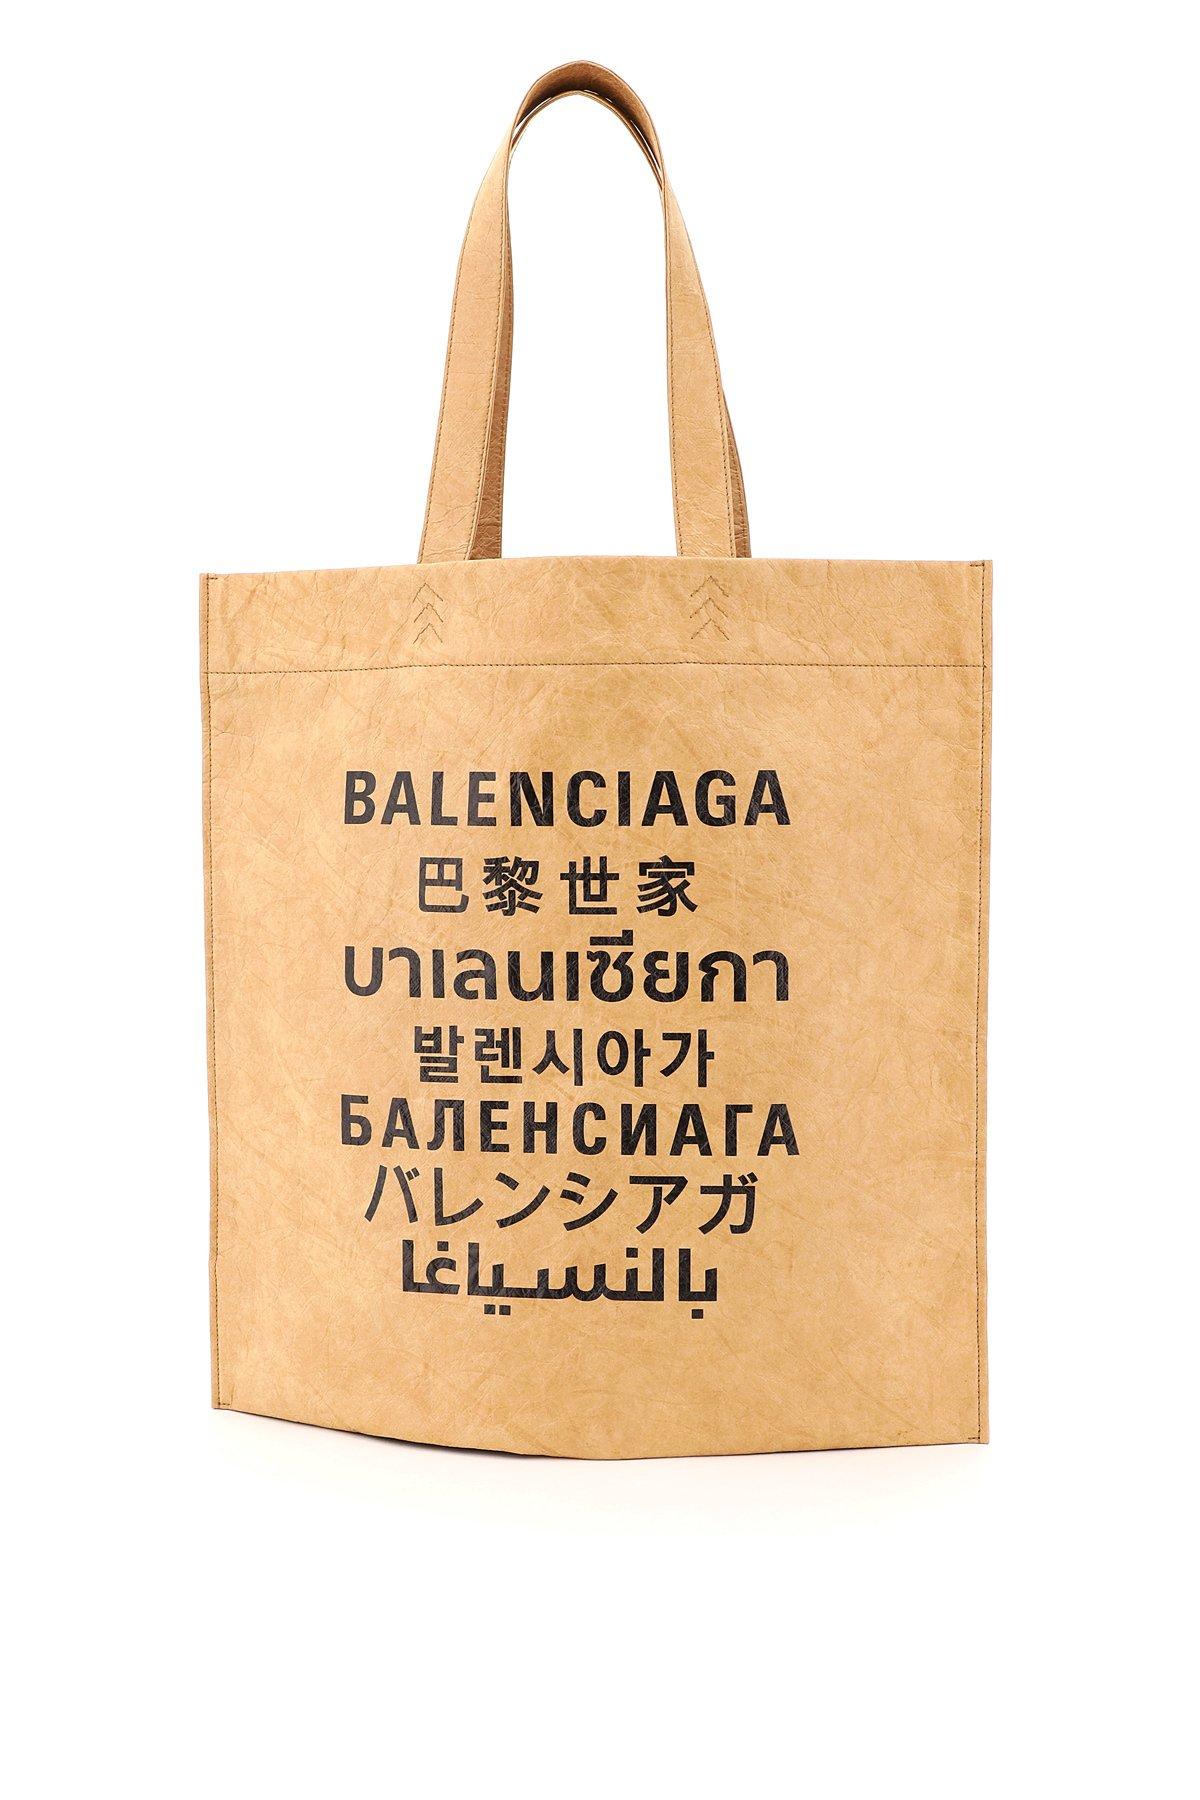 Balenciaga borsa tote m logo internazionale